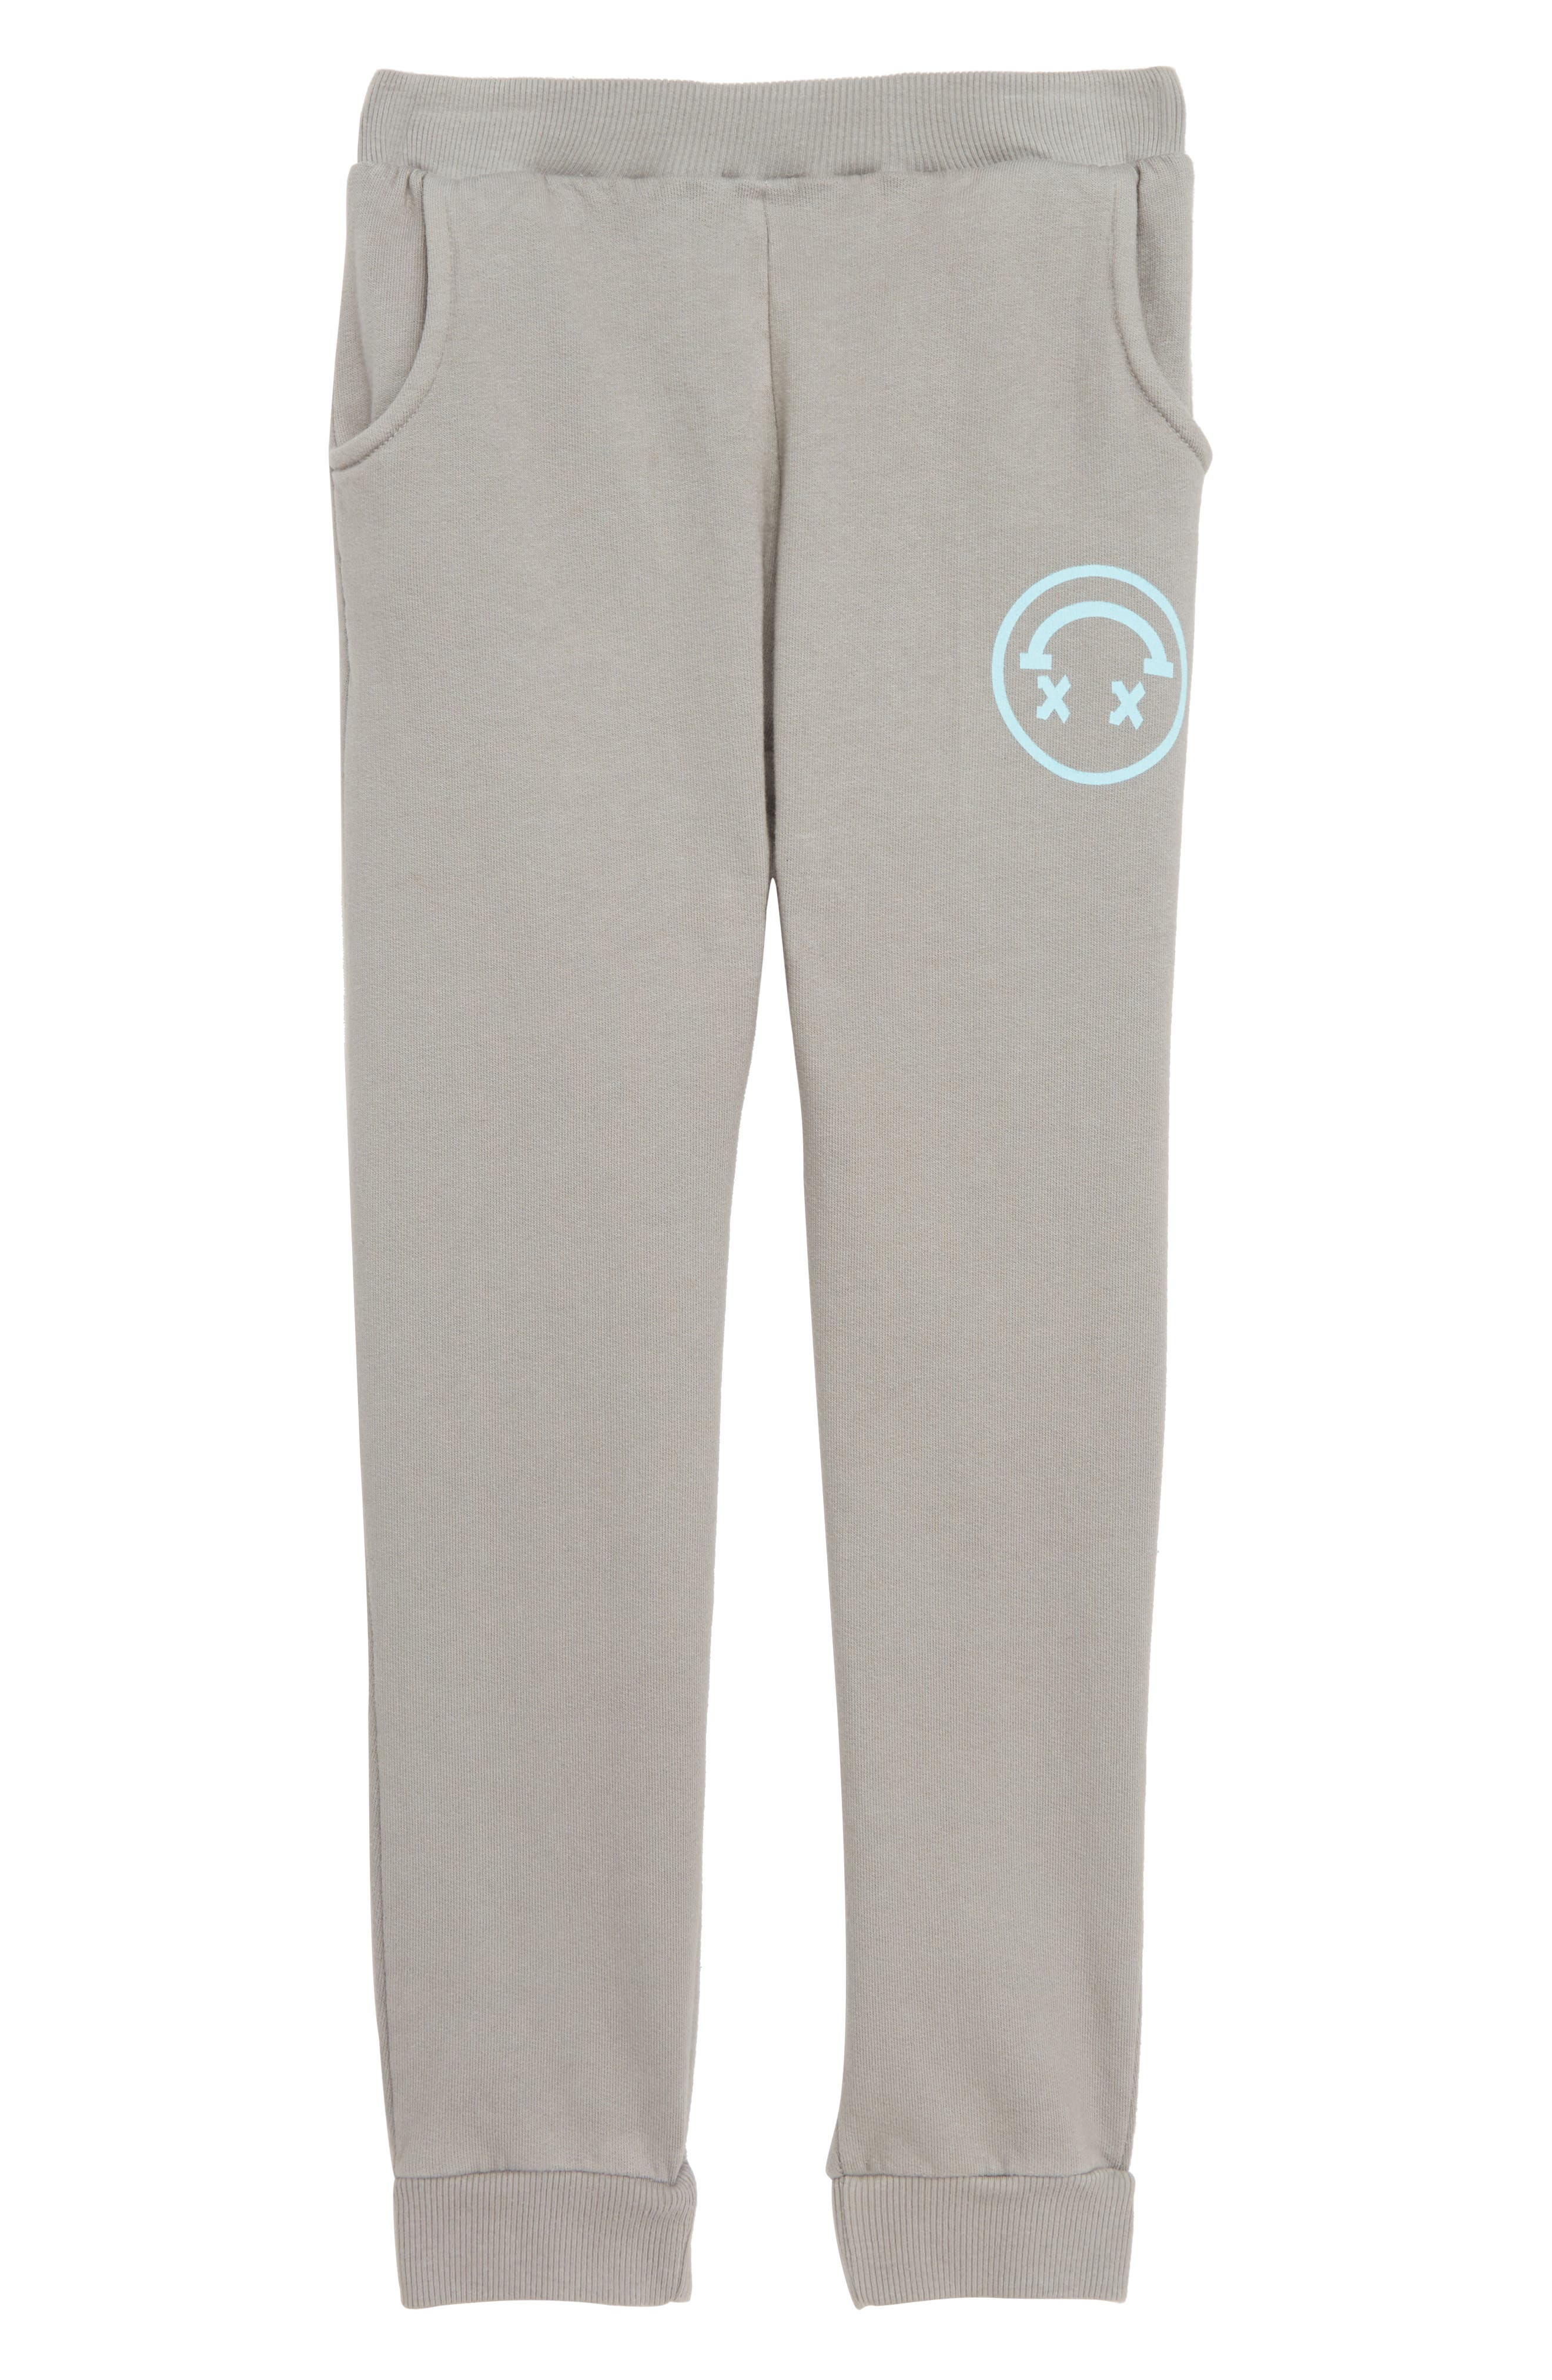 Still Chill Jogger Pants,                         Main,                         color, SLATE